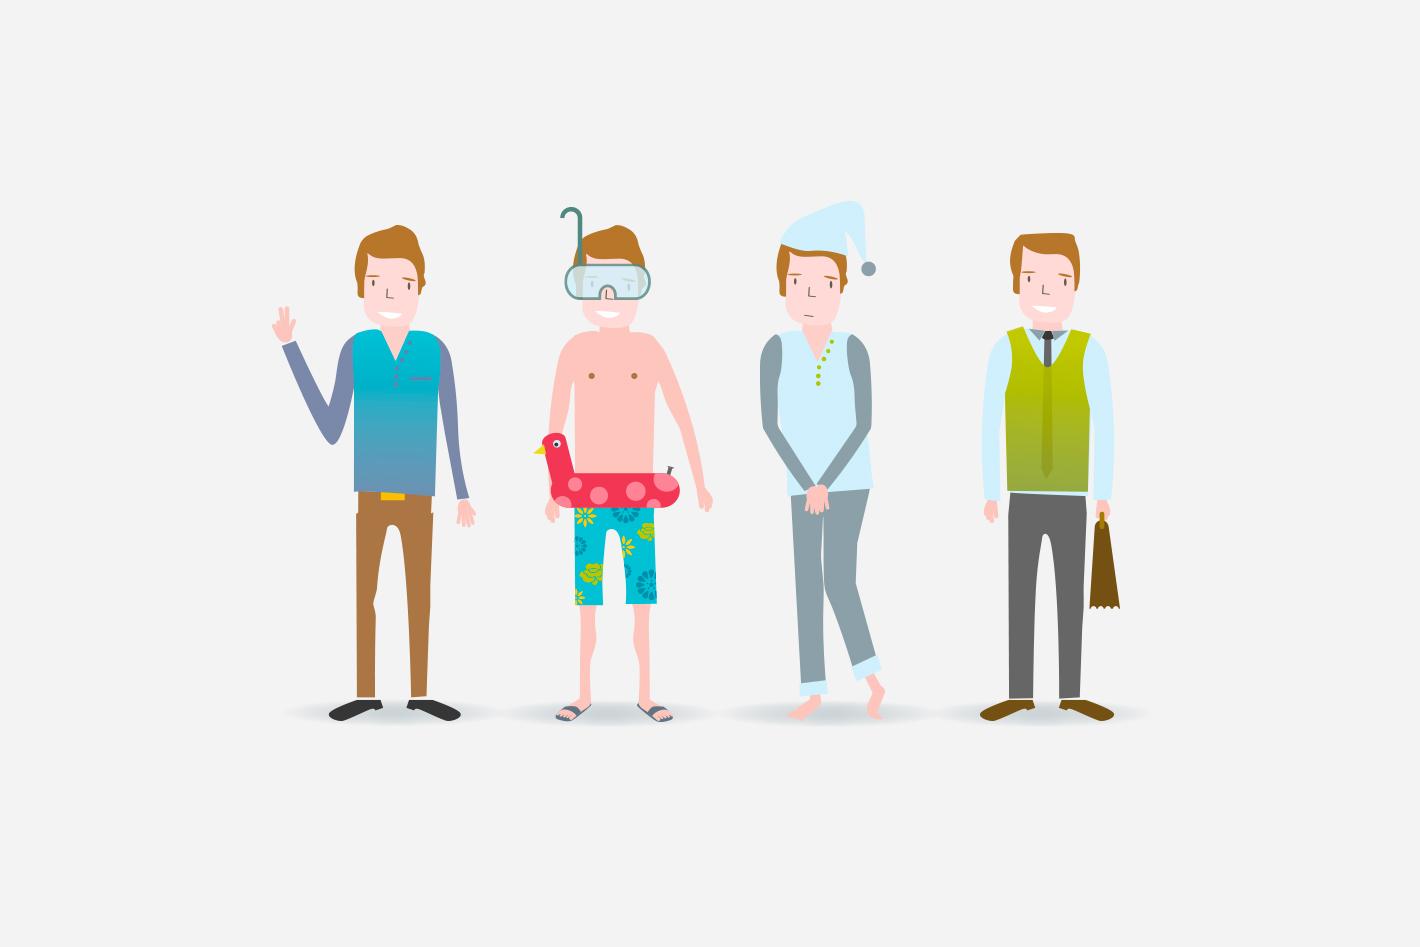 EWE-smart-living-erklärvideo-design-illustration-animation-breit.jpg